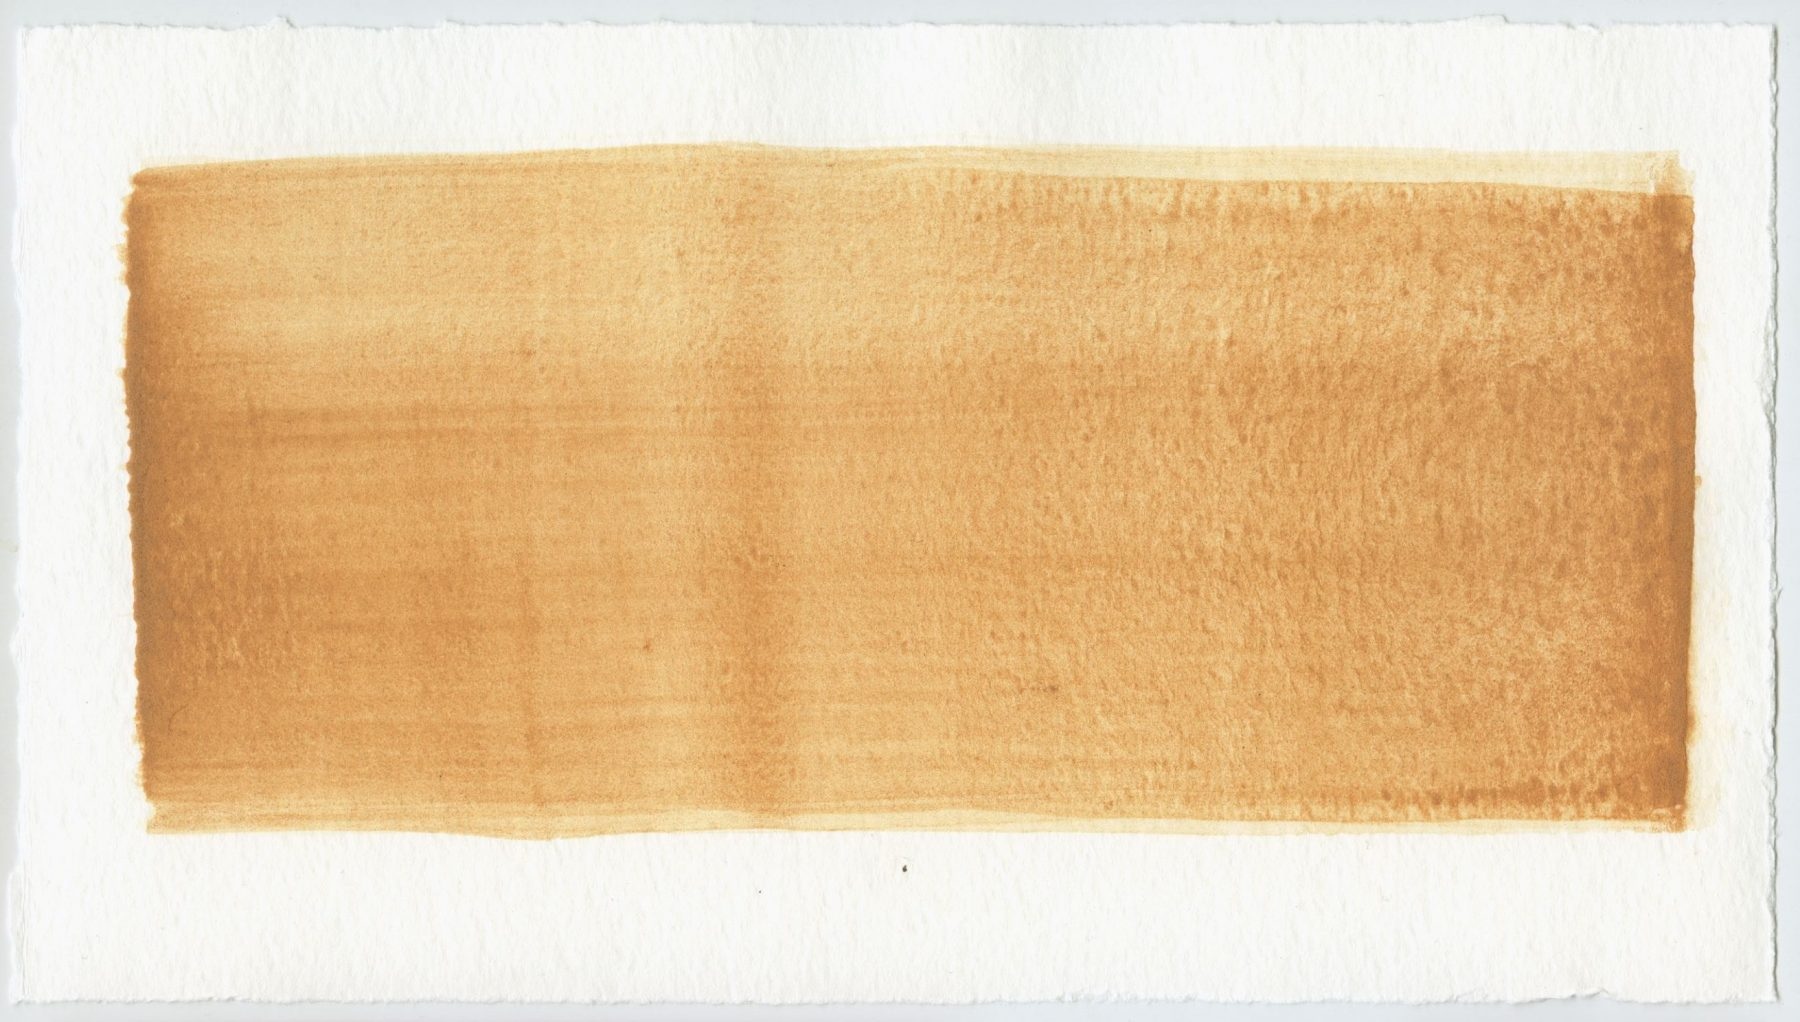 Brush stroke no. 12 - Selfmade pigment: Perekker roze